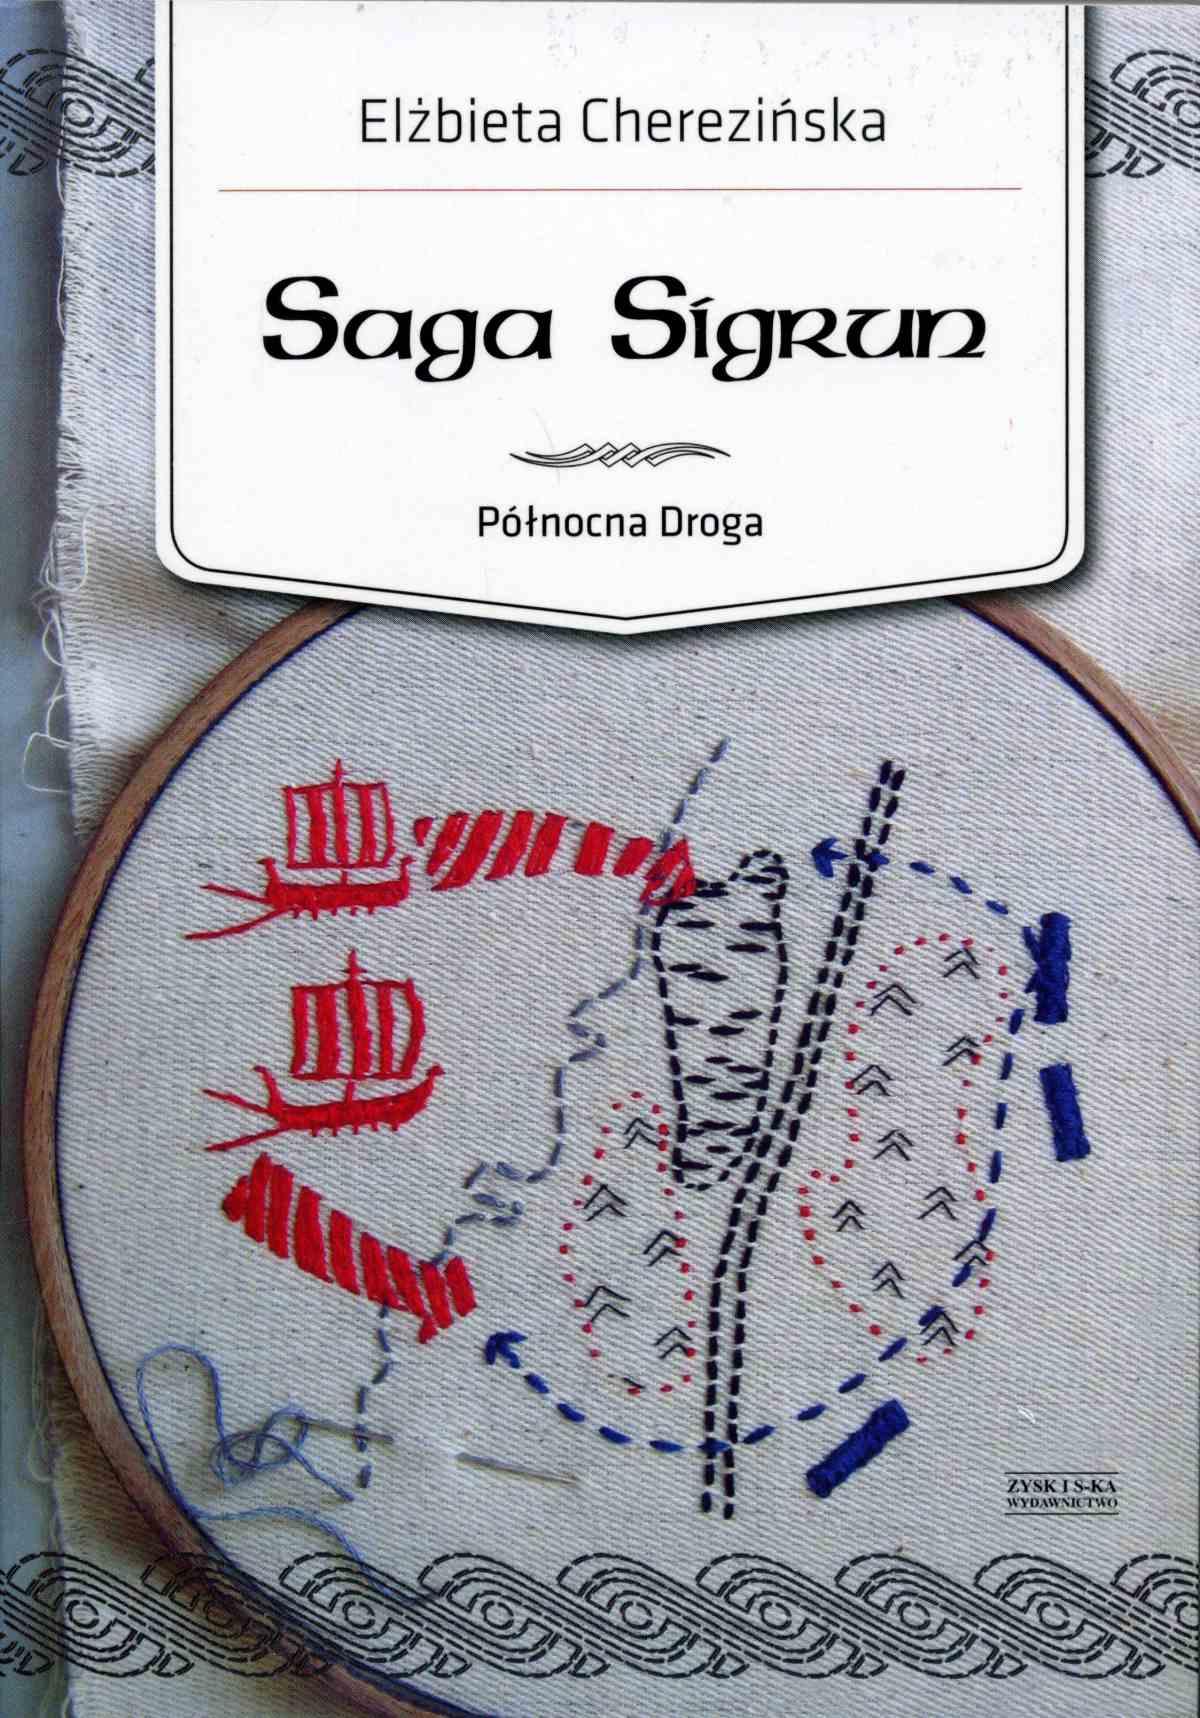 Saga Sigrun - Ebook (Książka na Kindle) do pobrania w formacie MOBI